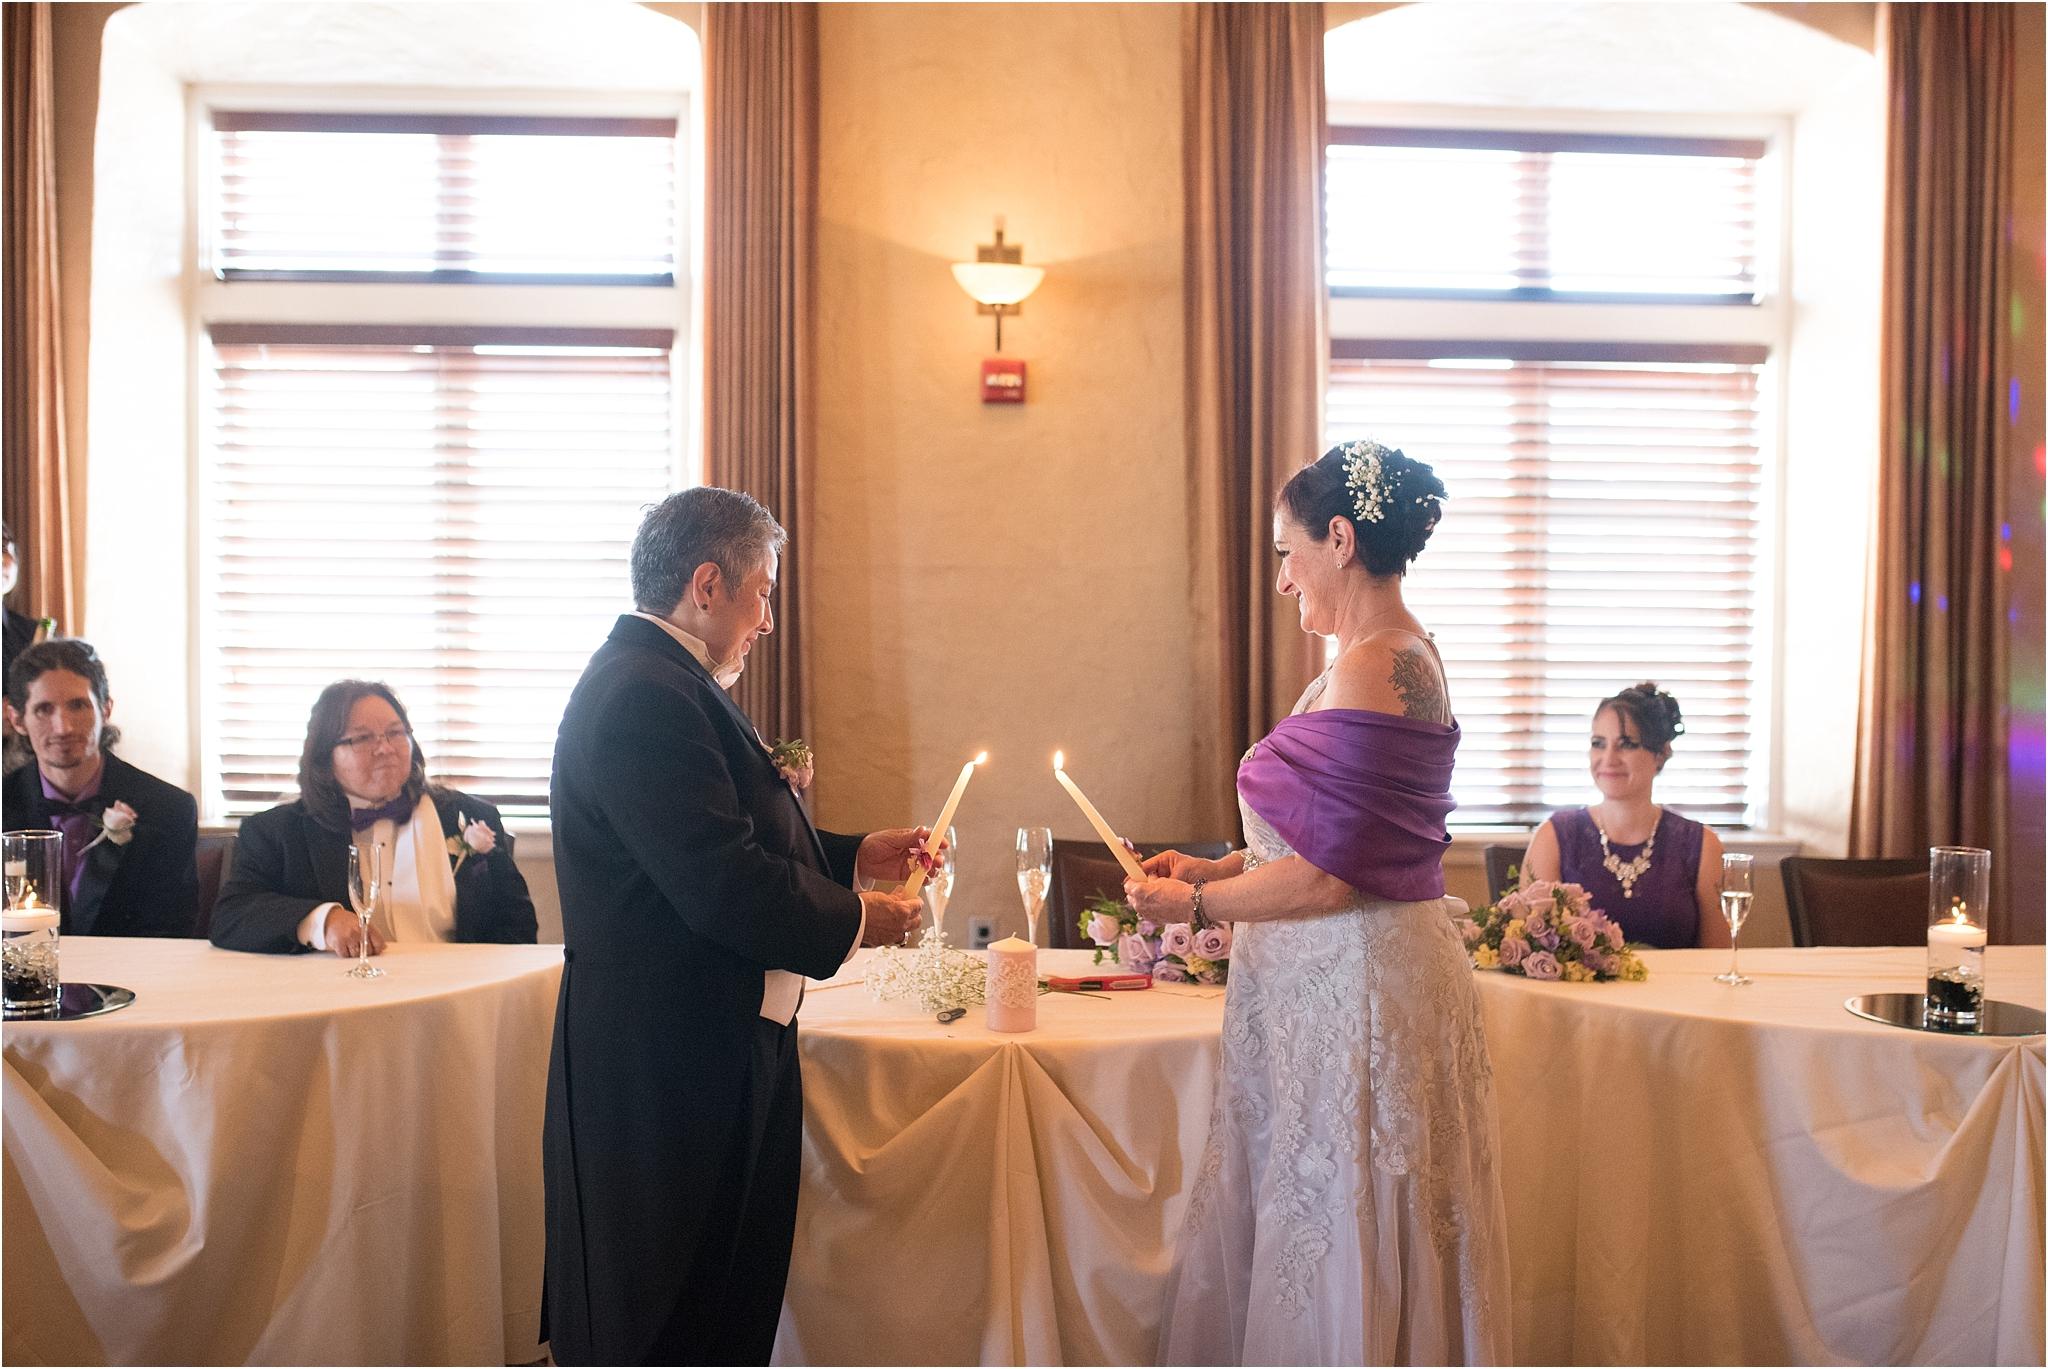 kayla kitts photography - albuquerque wedding photographer - hotel andaluz wedding_0023.jpg